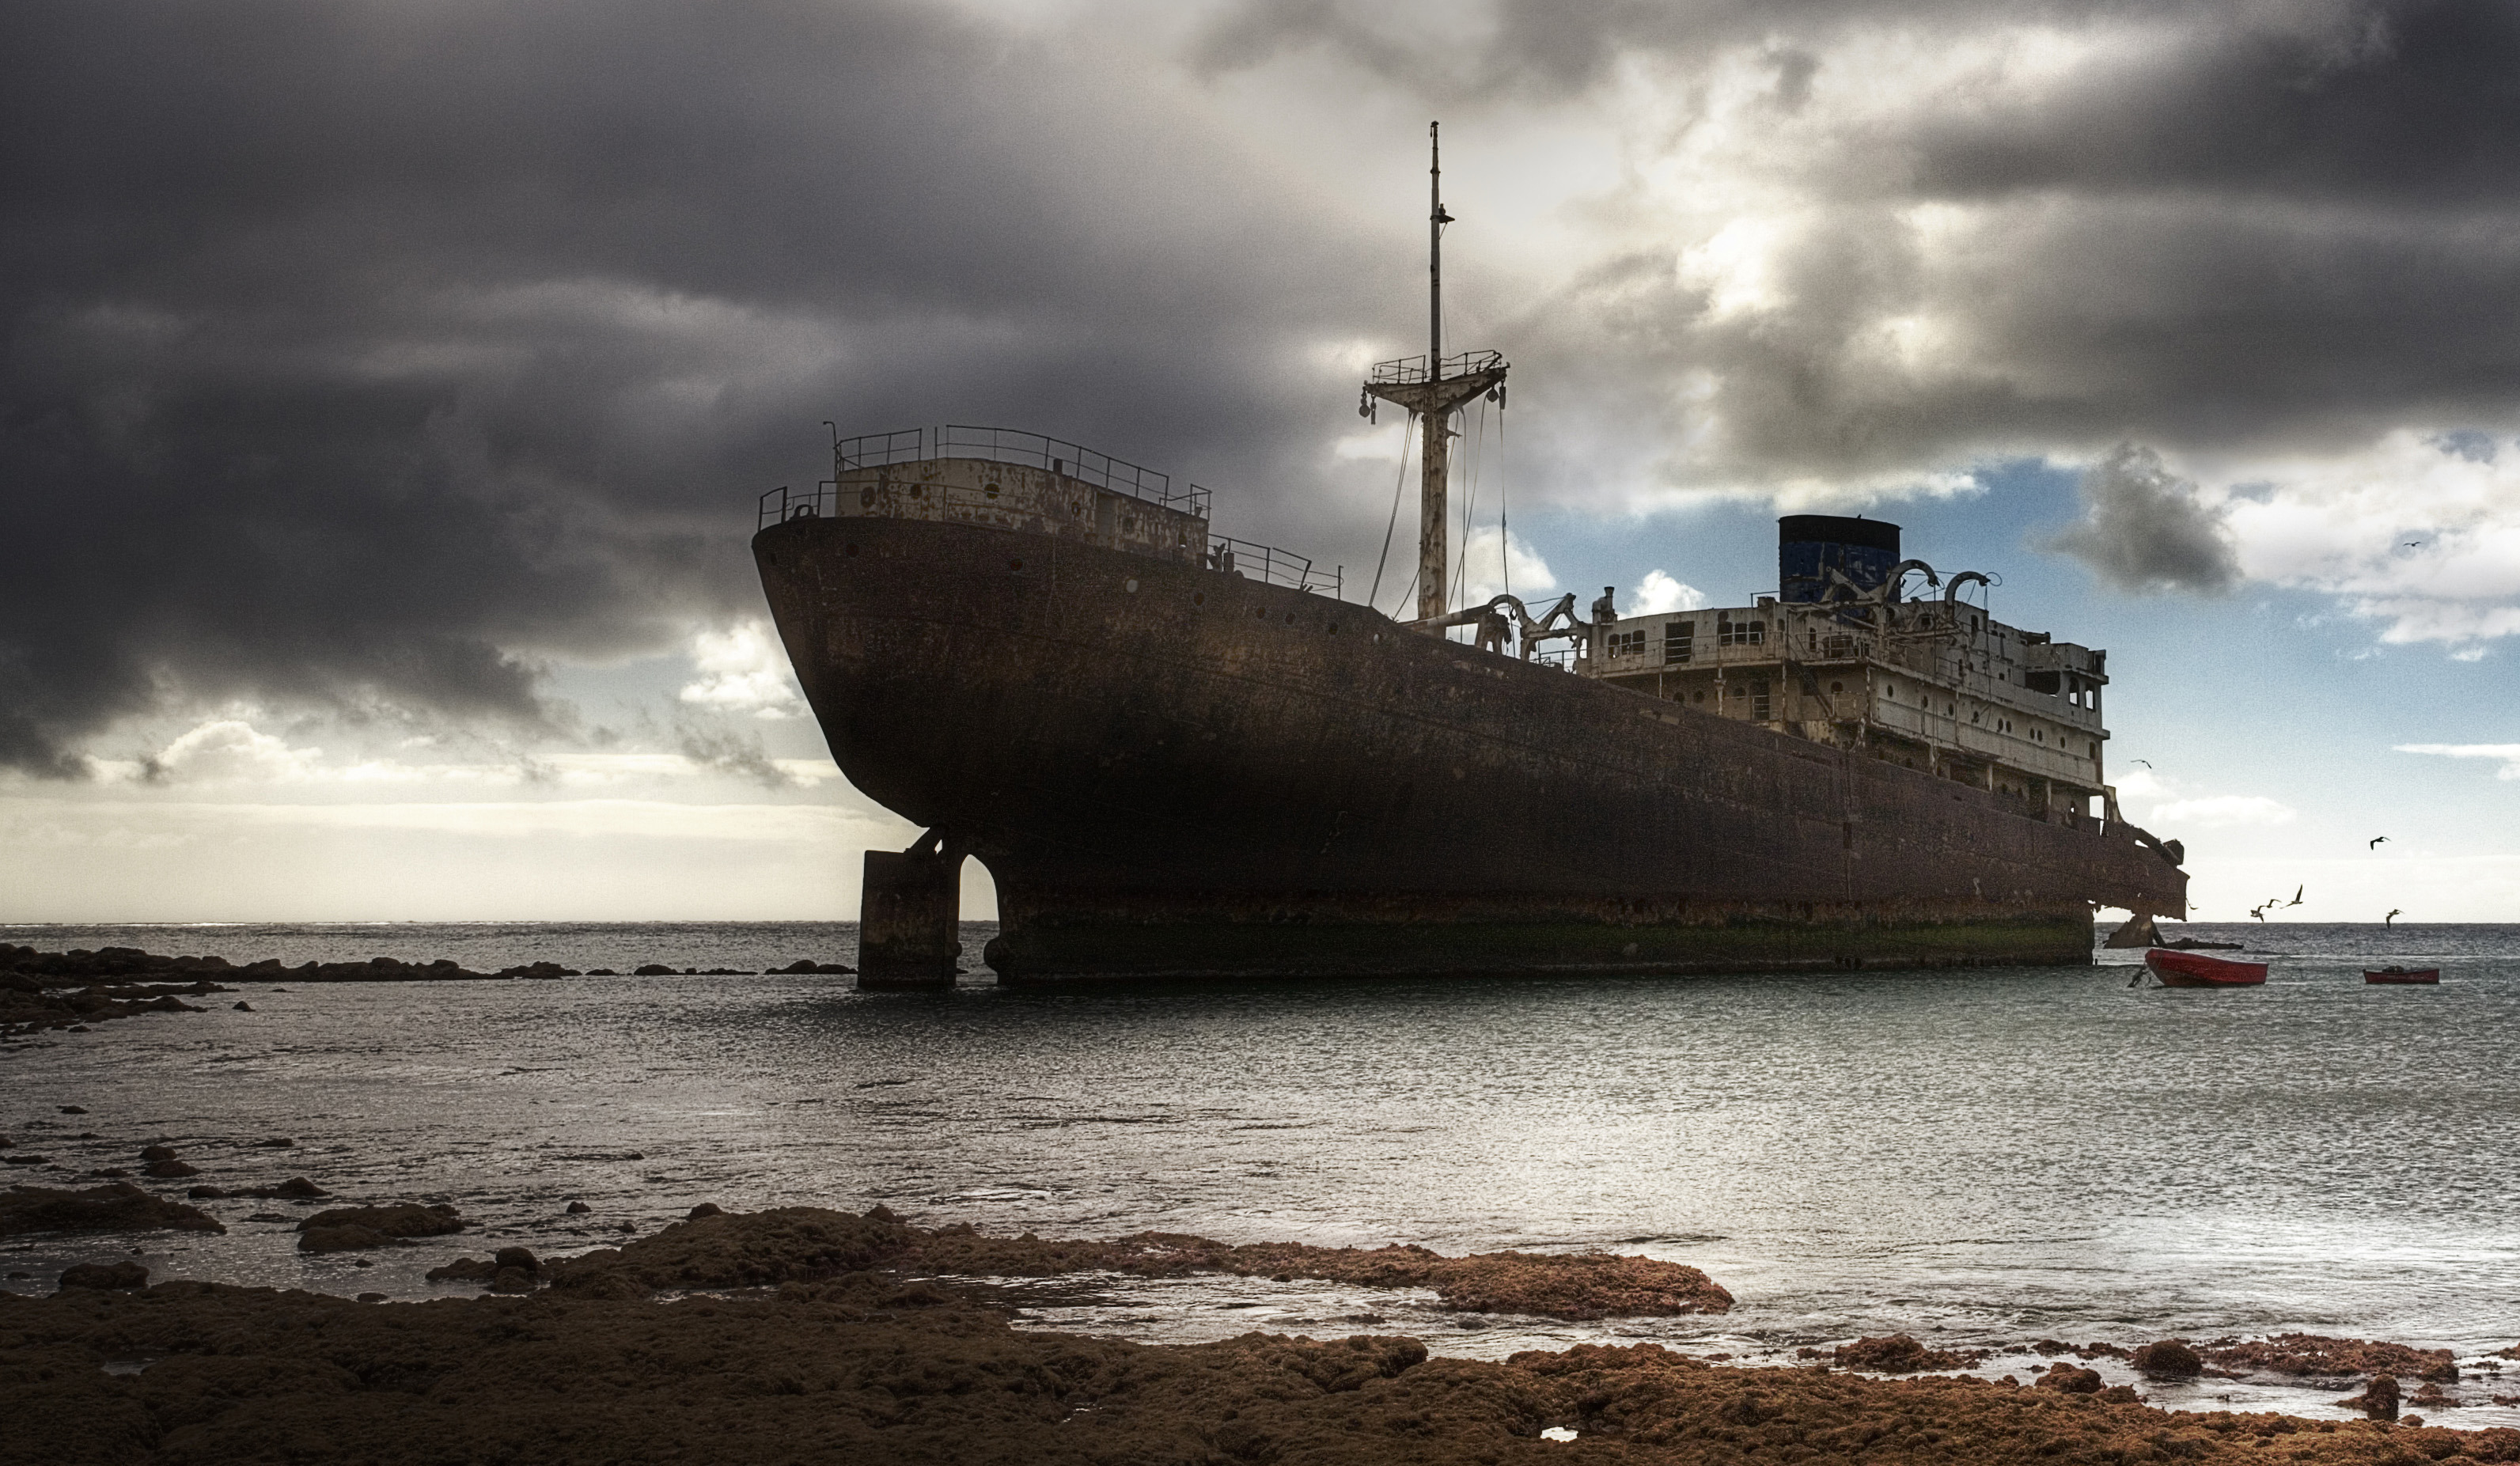 Vehicles Wreck Wallpaper Shipwreck Full HD